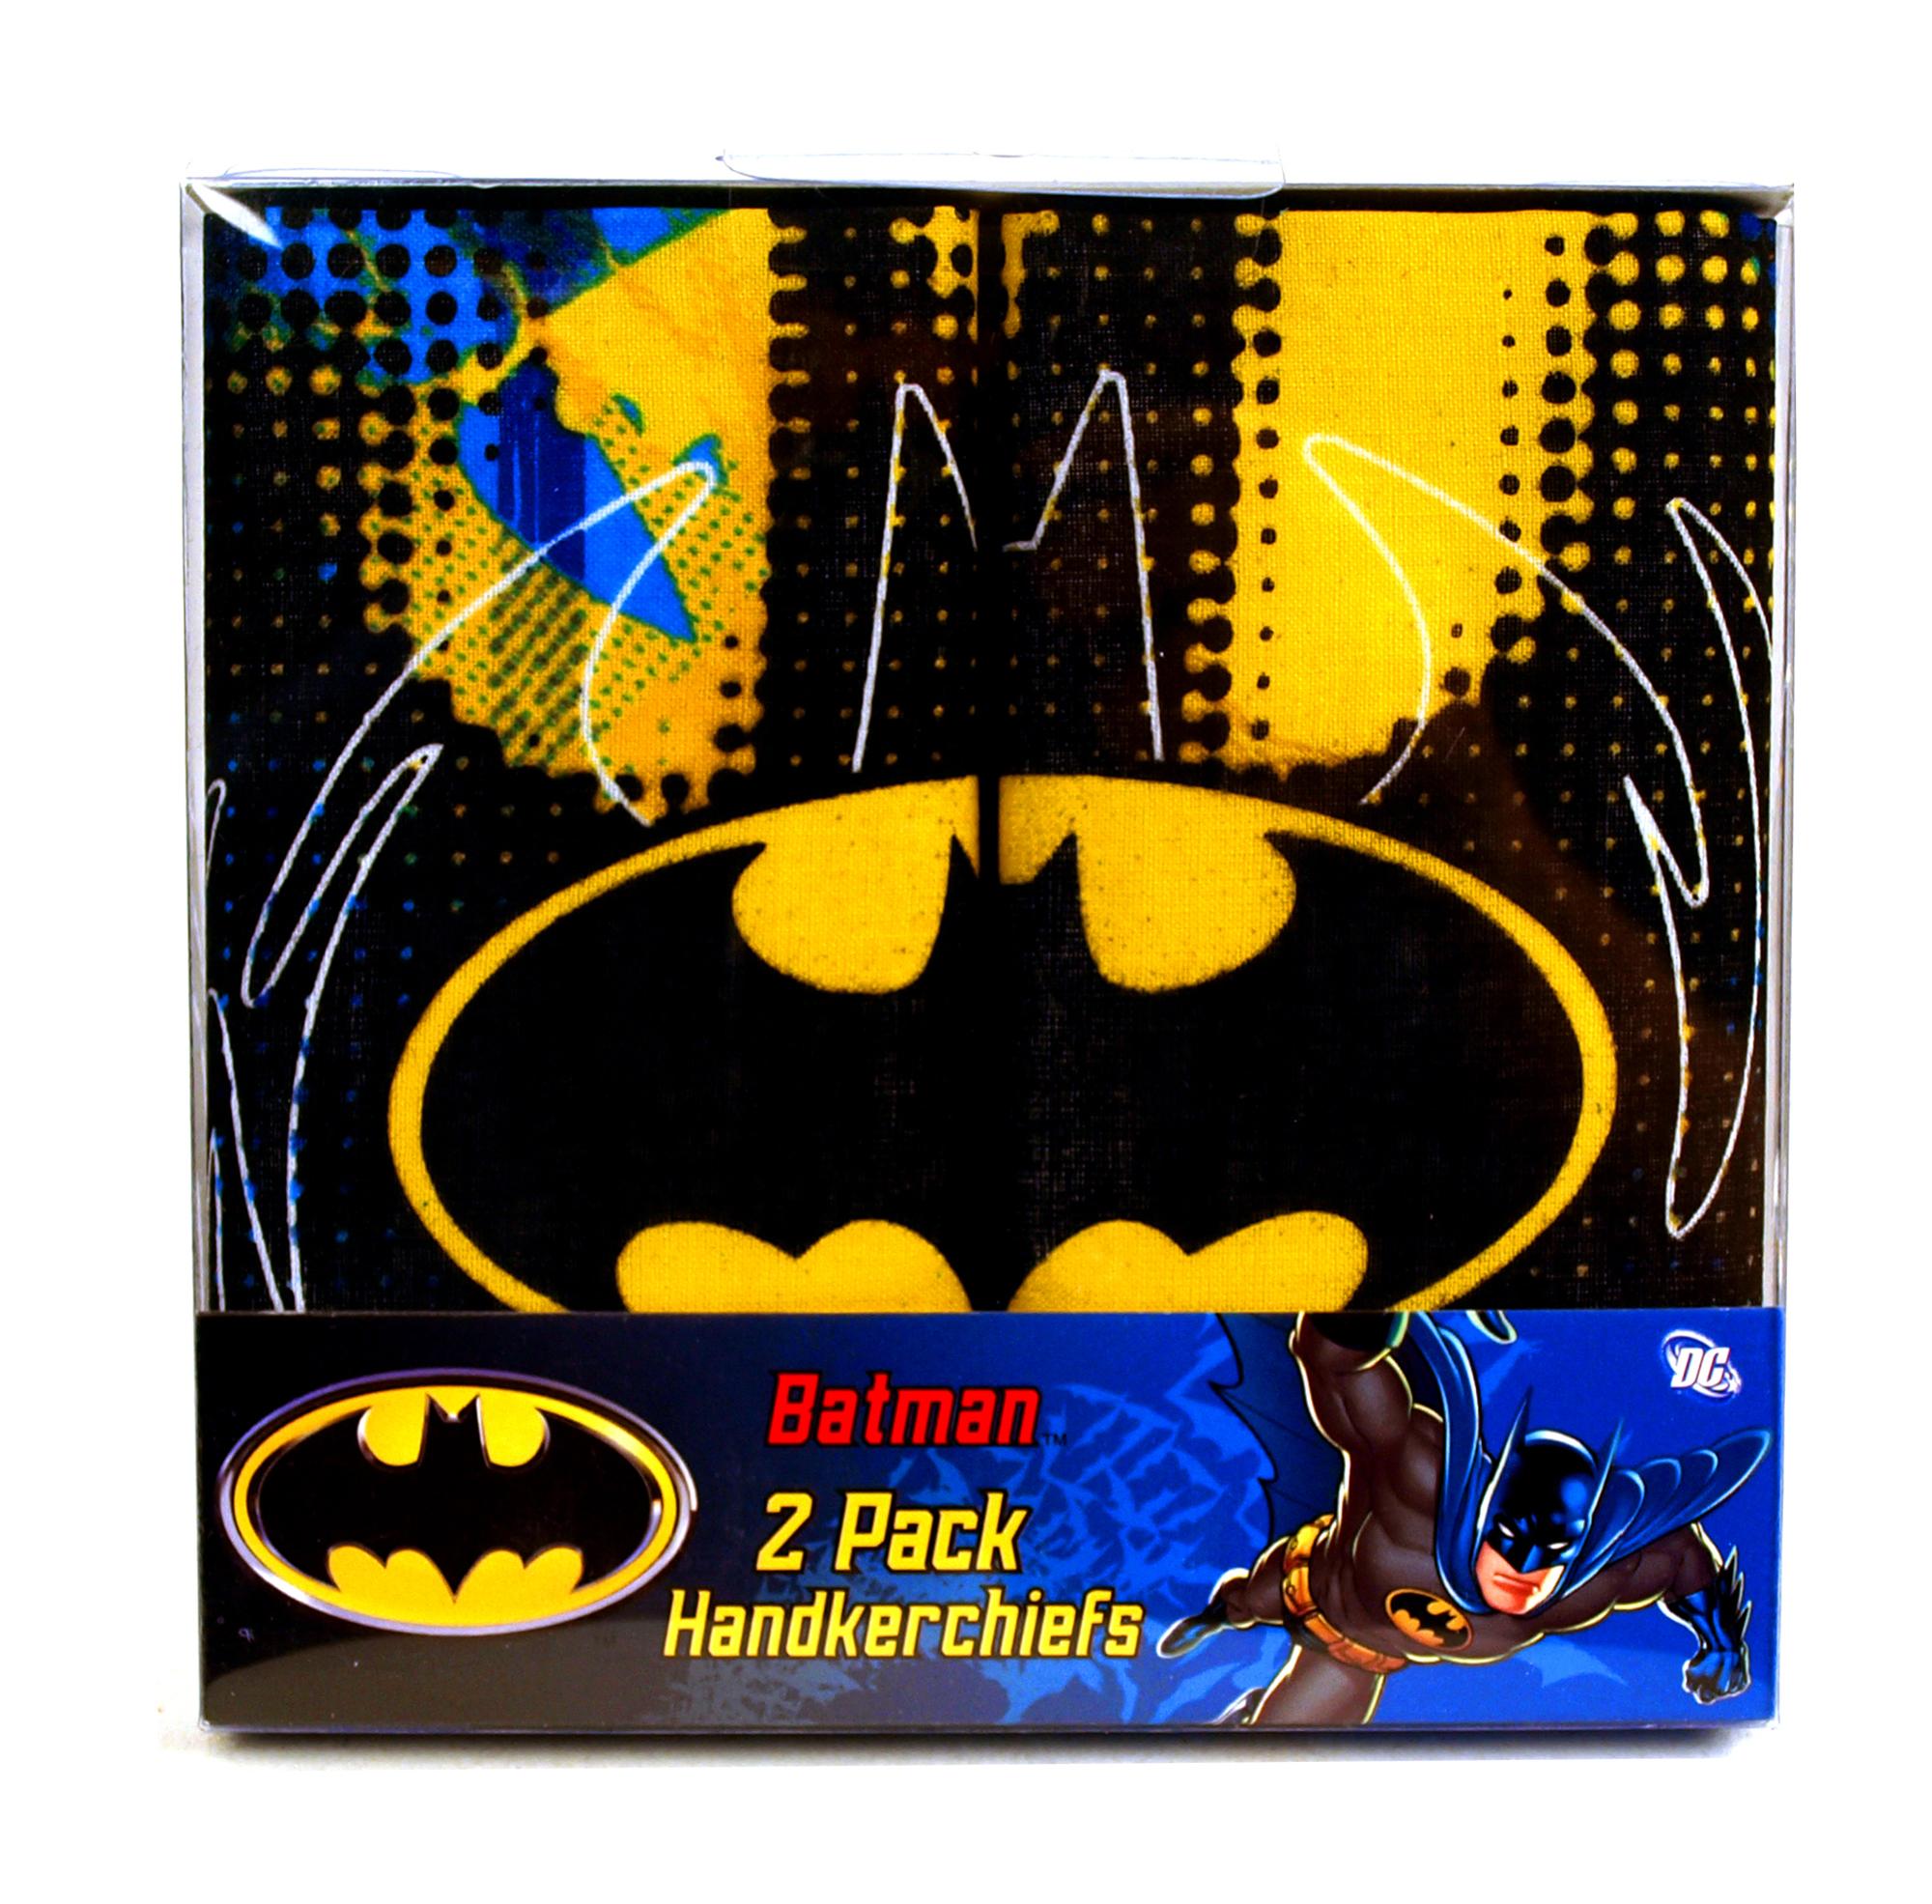 Batman - Classic Logo - 2 Pack Handkerchiefs Thumbnail 1 854dab18a3cd6